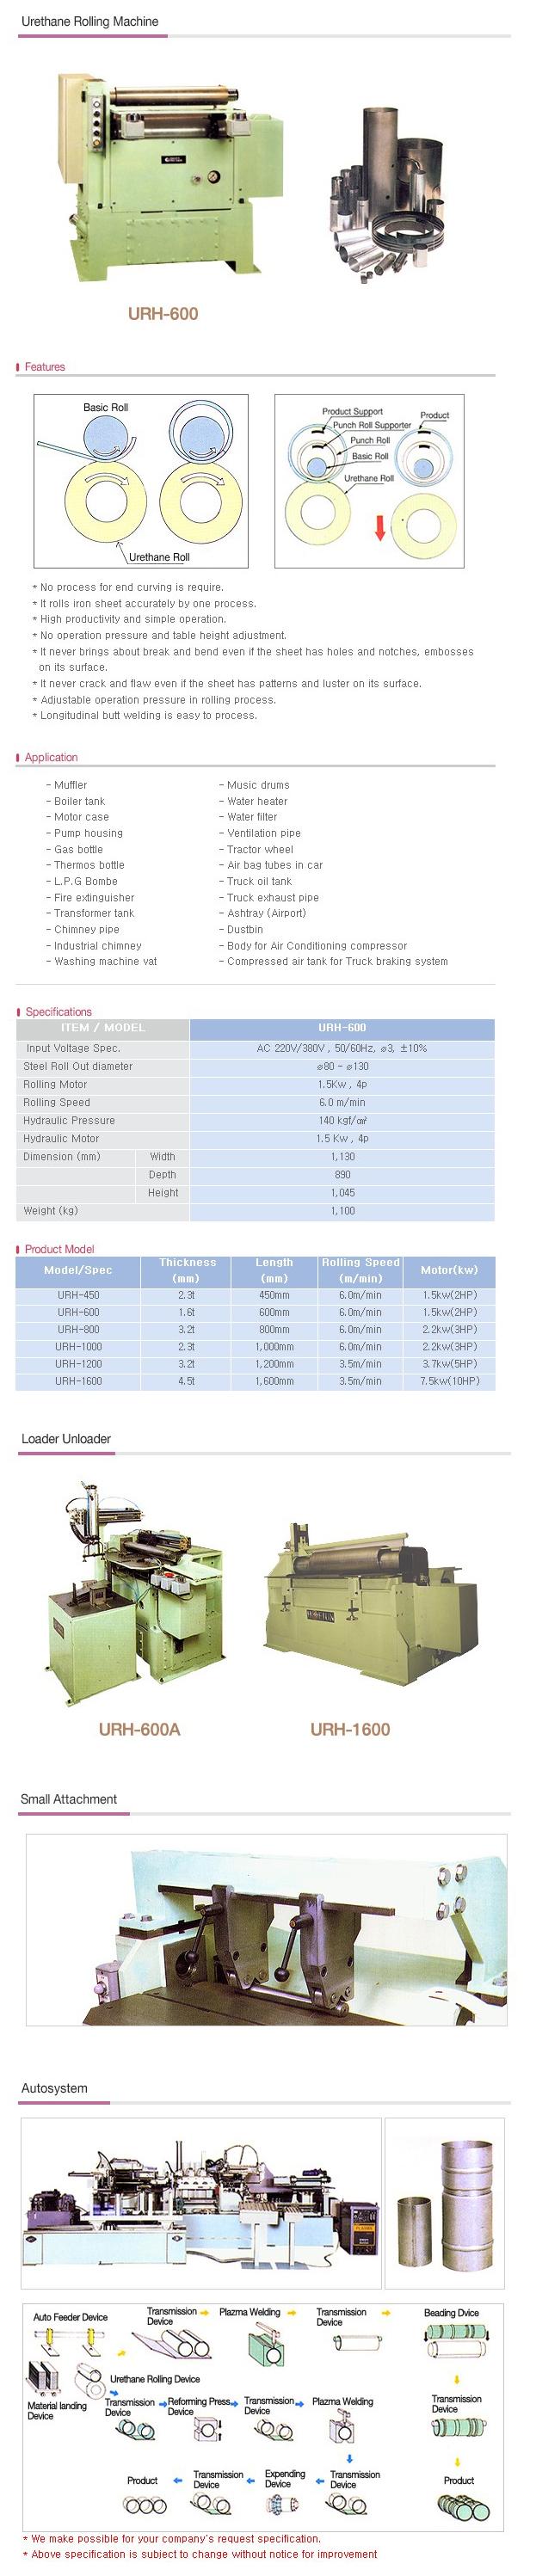 HOE JUN PRECISION Urethane Rolling Machine URH Series